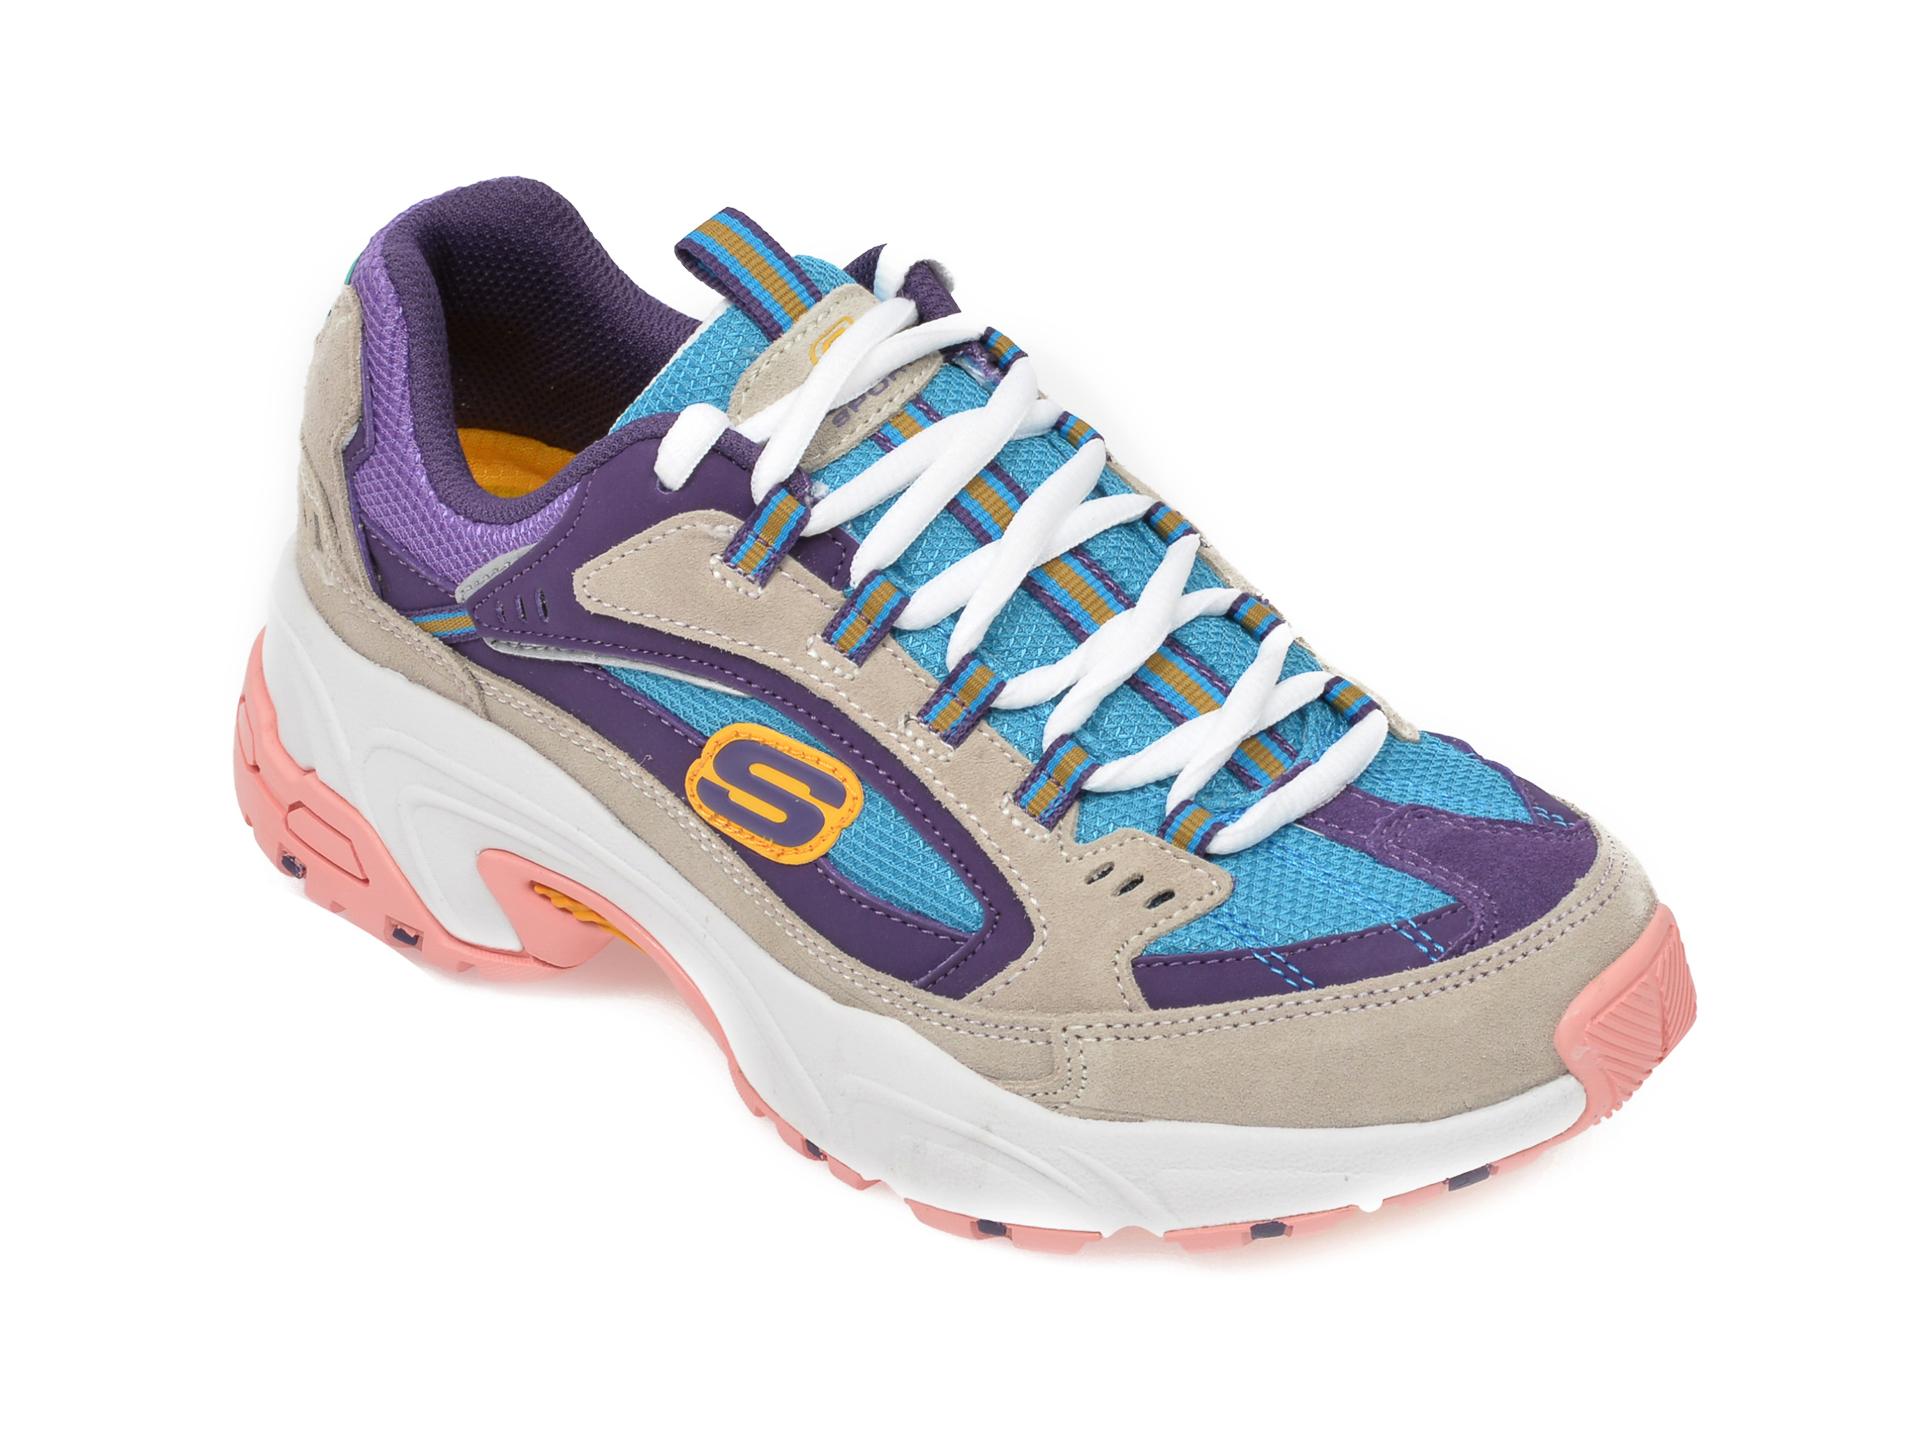 Pantofi sport SKECHERS multicolor, Stamina Sugar Rocks, din piele naturala New